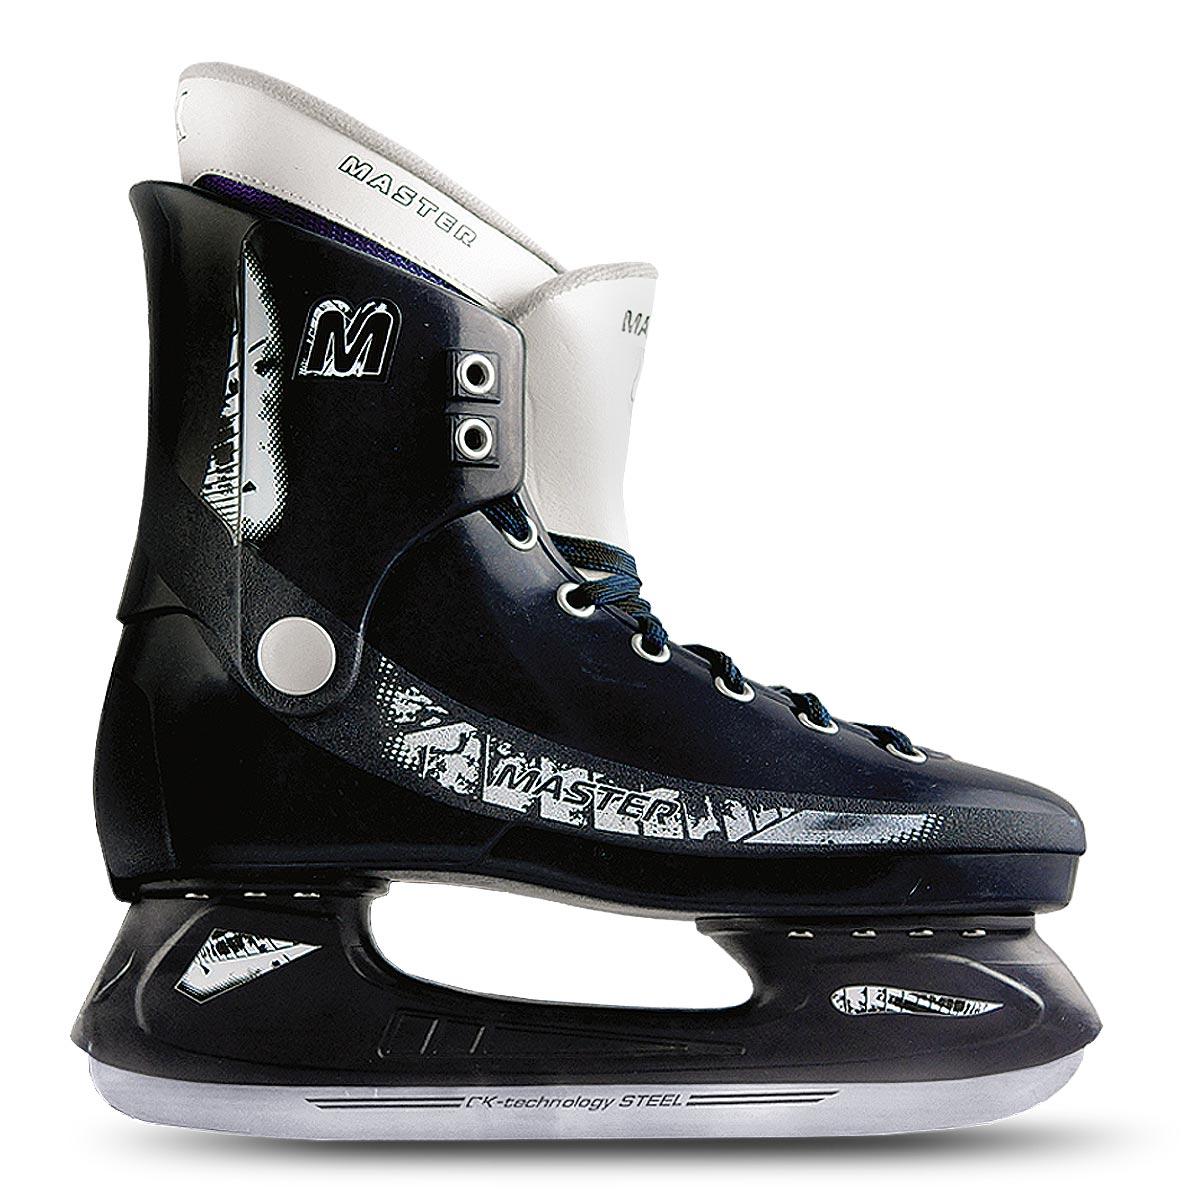 CK Коньки хоккейные для мальчика Master Deluxe